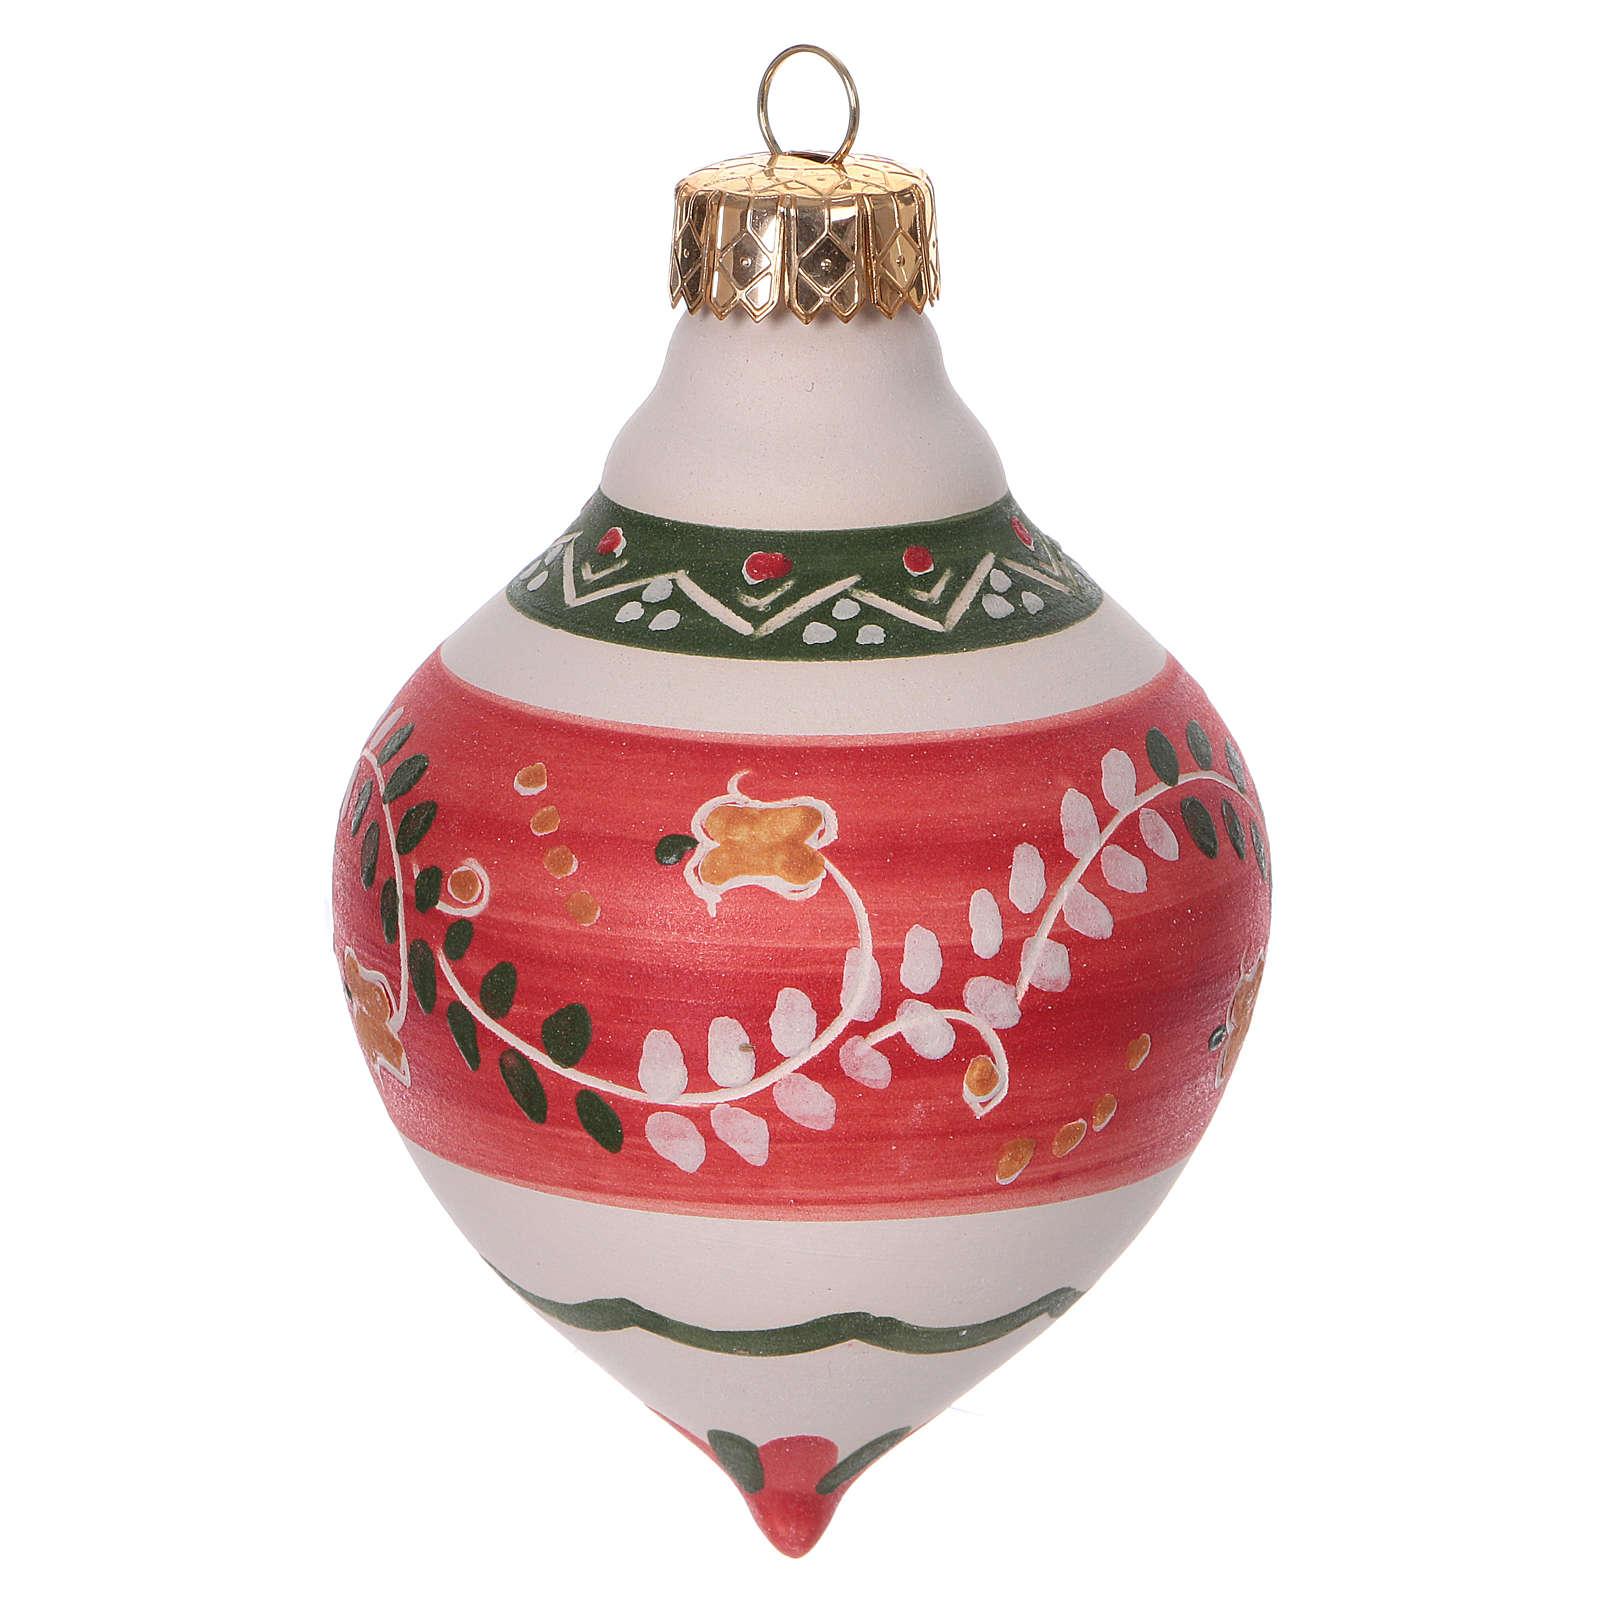 Bola con doble punta roja para árbol Navidad de terracota 120 mm 4